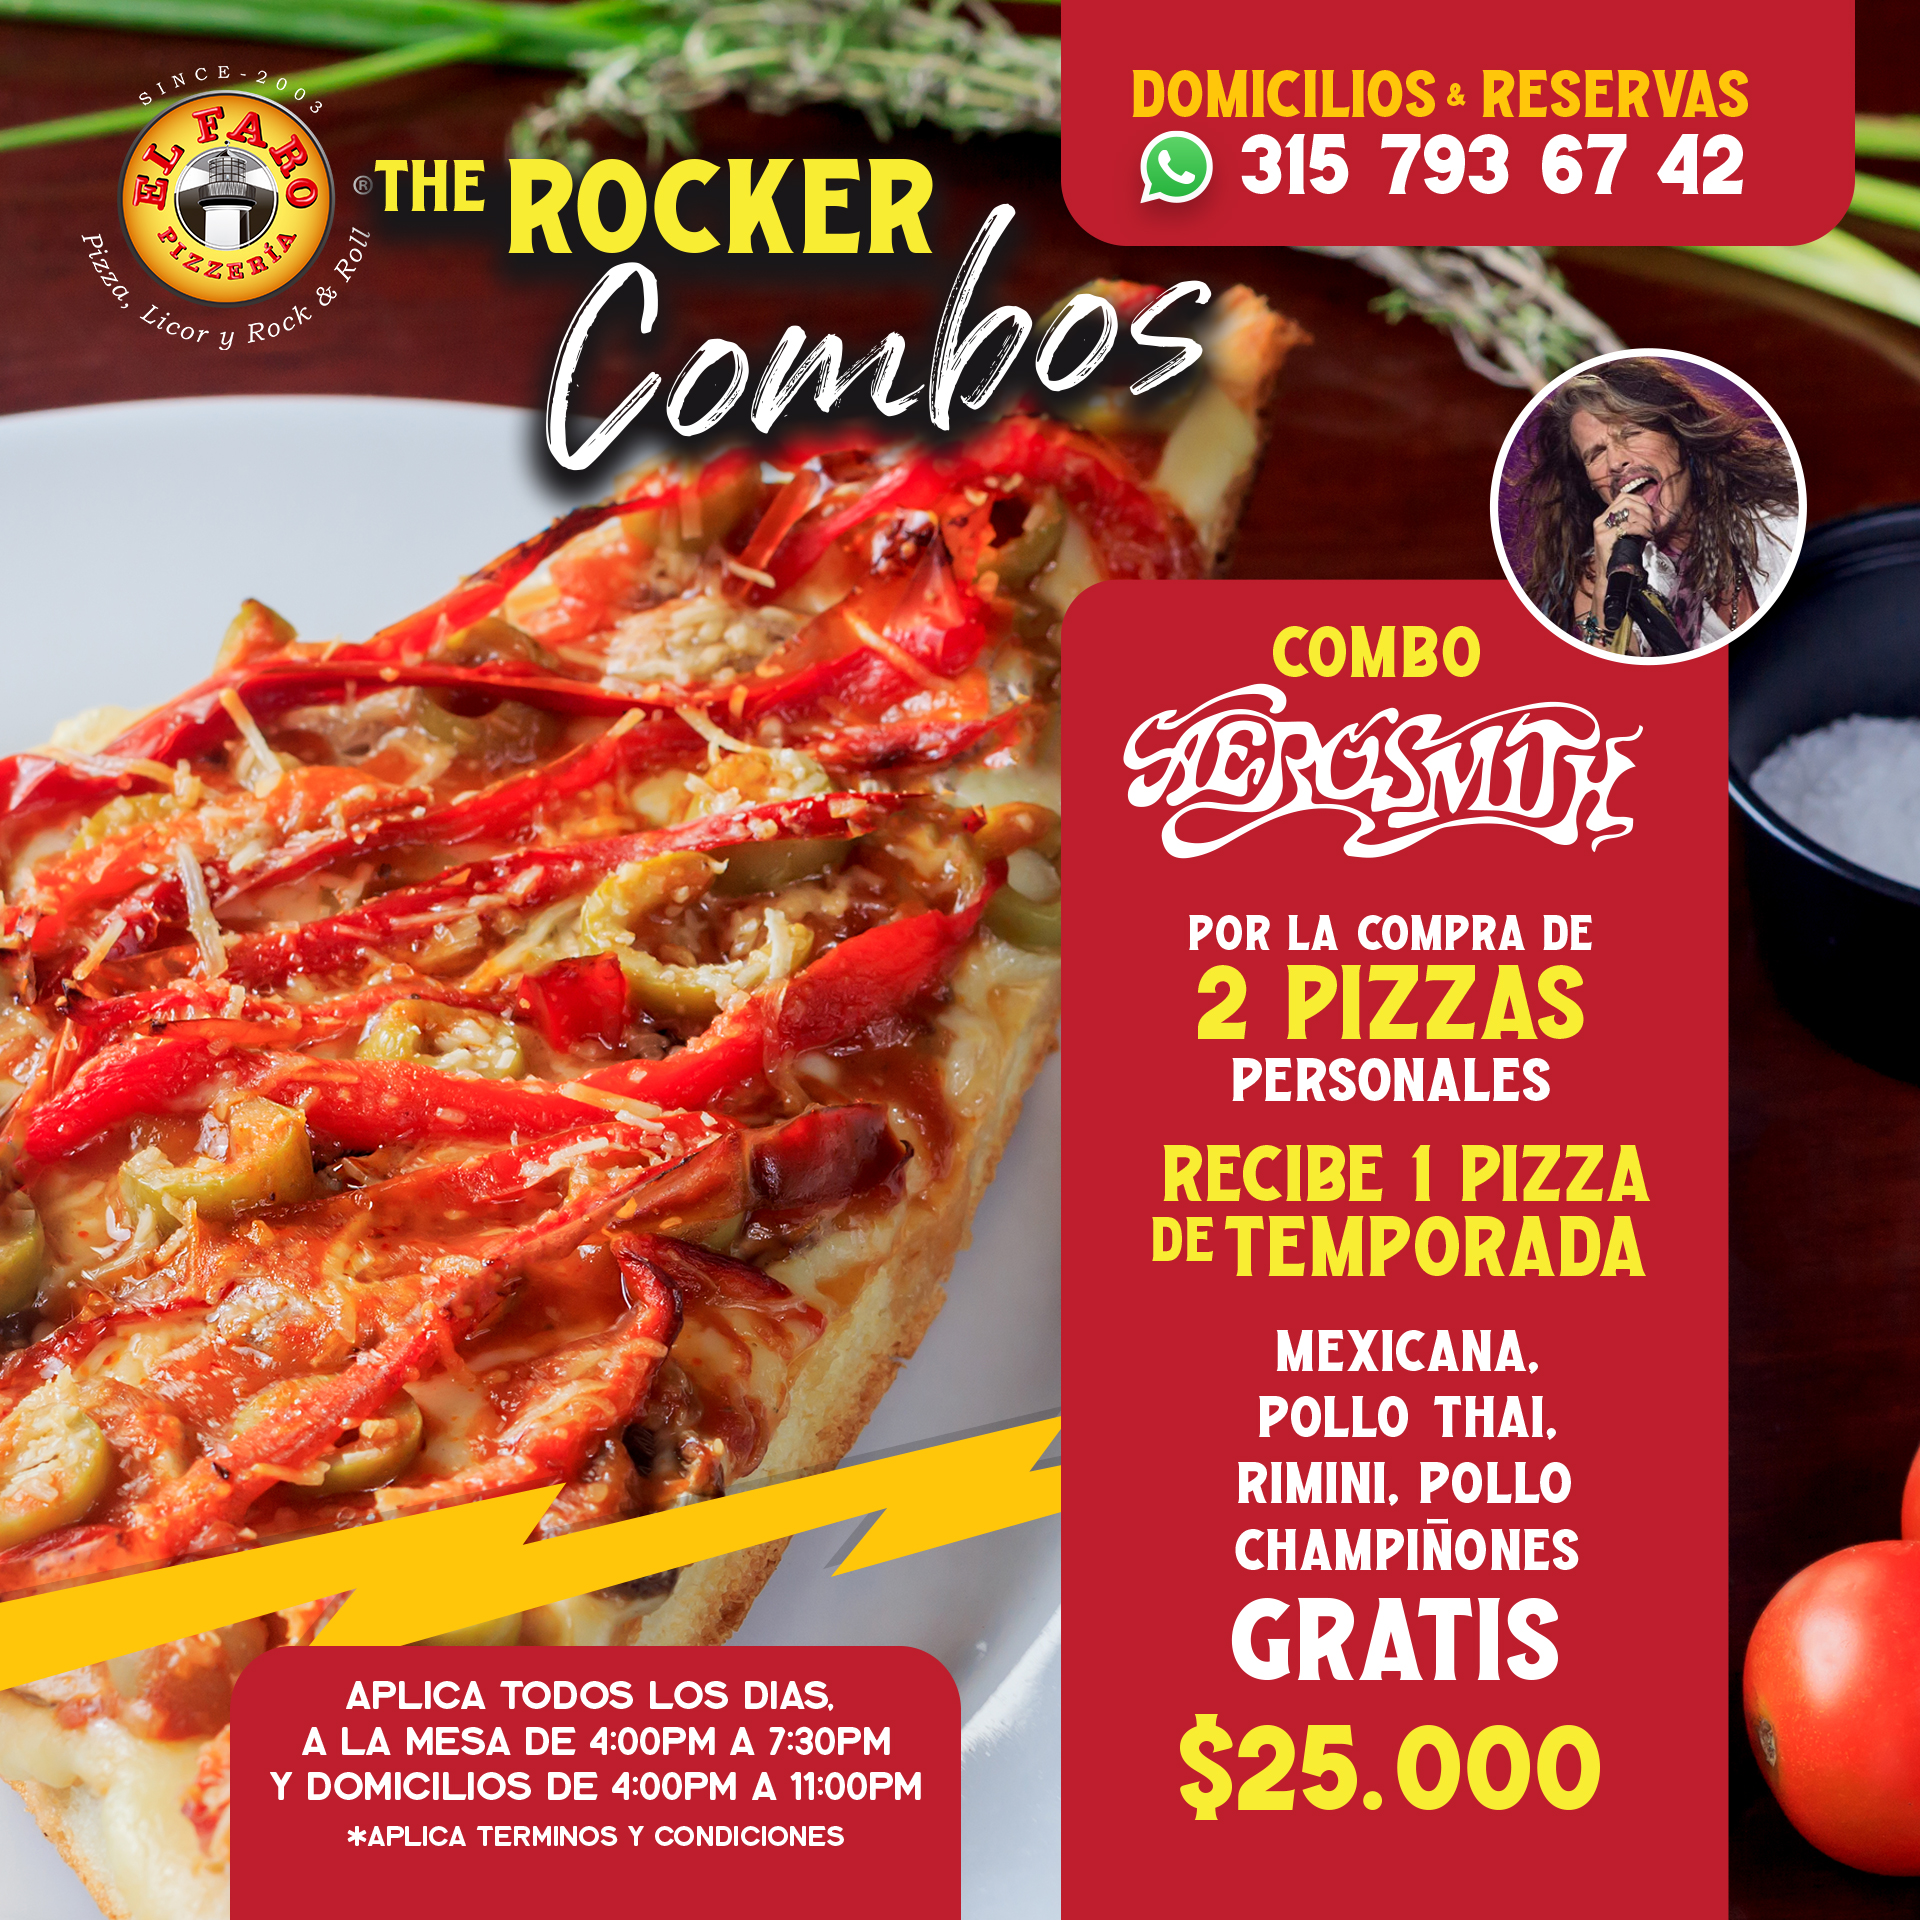 2--ROCKING-COMBO-2--AEROSMITH-SQ